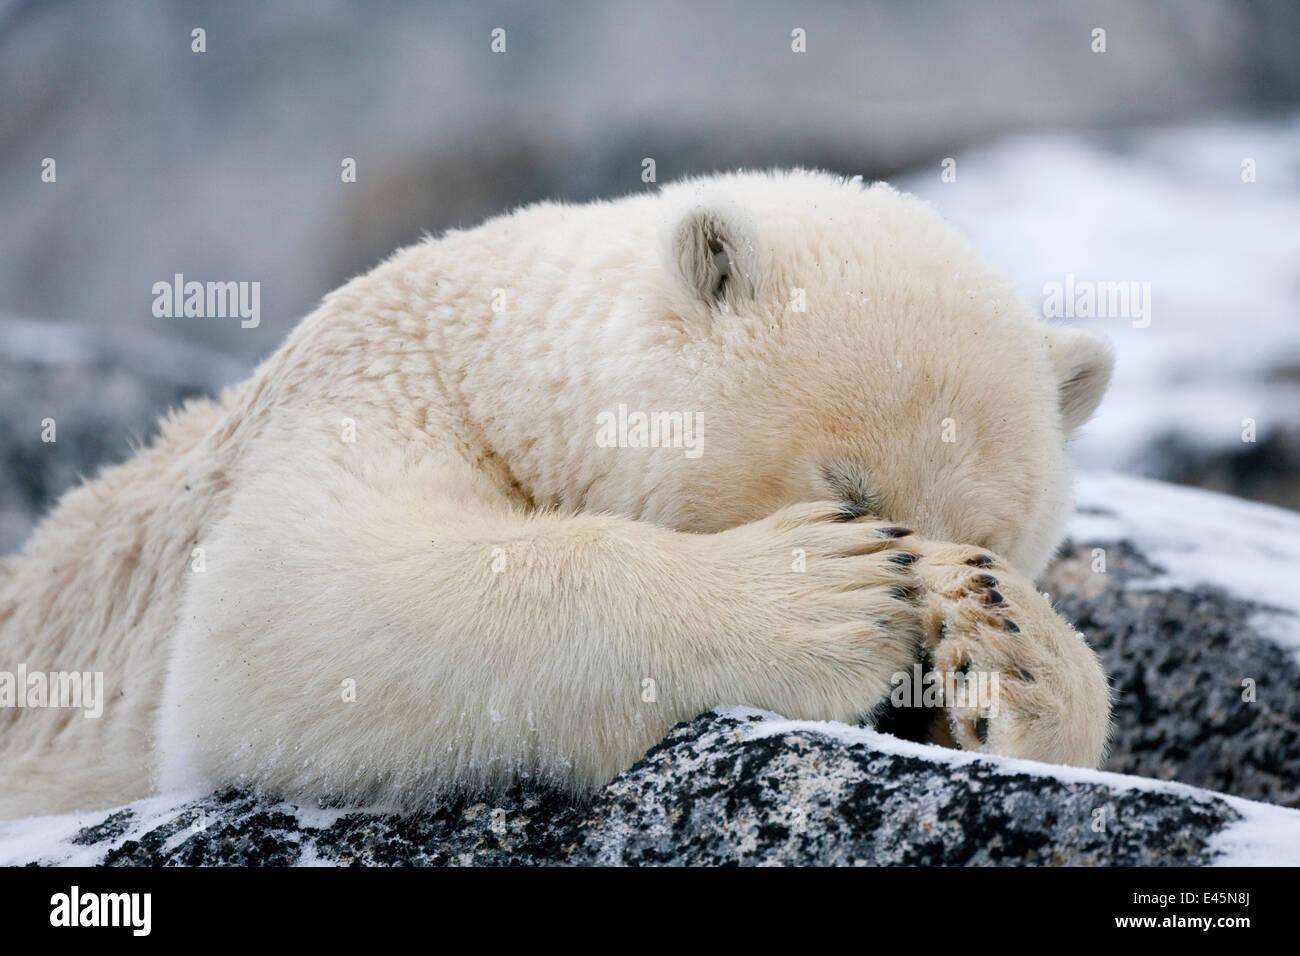 Polar bear (Ursus maritimus) with paws covering eyes, Svalbard, Norway, September 2009 - Stock Image